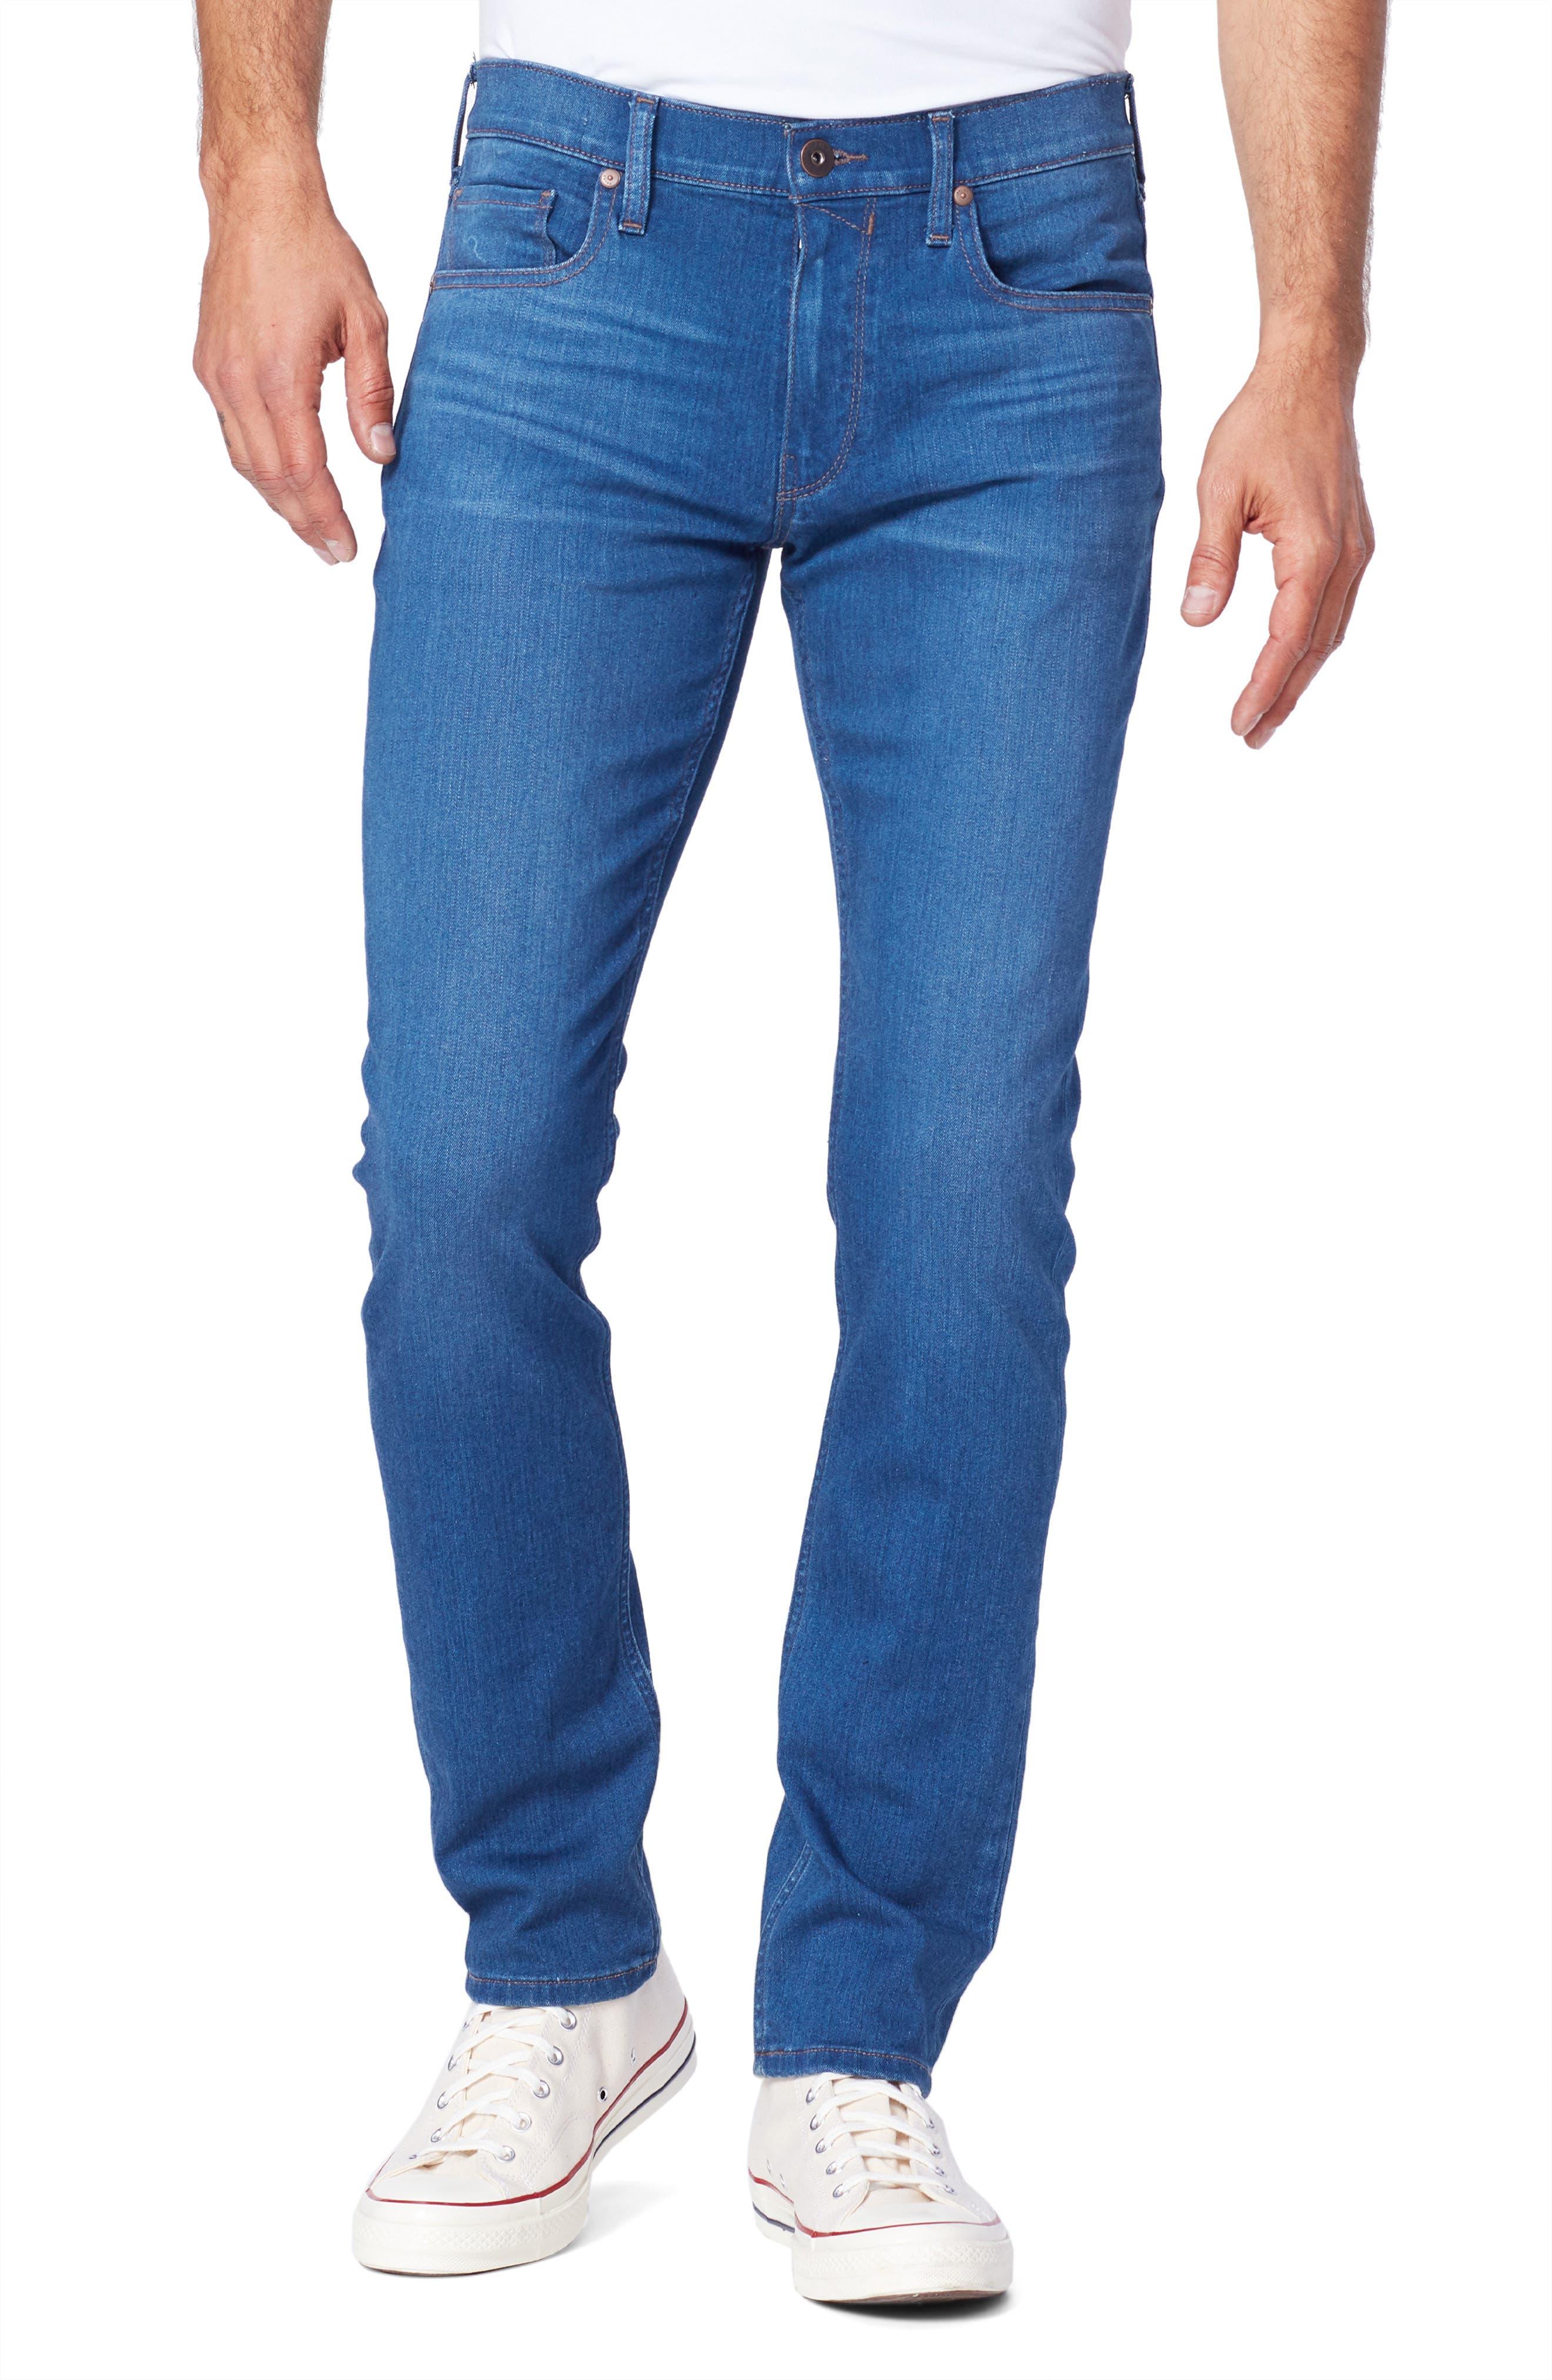 Image of PAIGE Transcend Lennox Slim Jeans